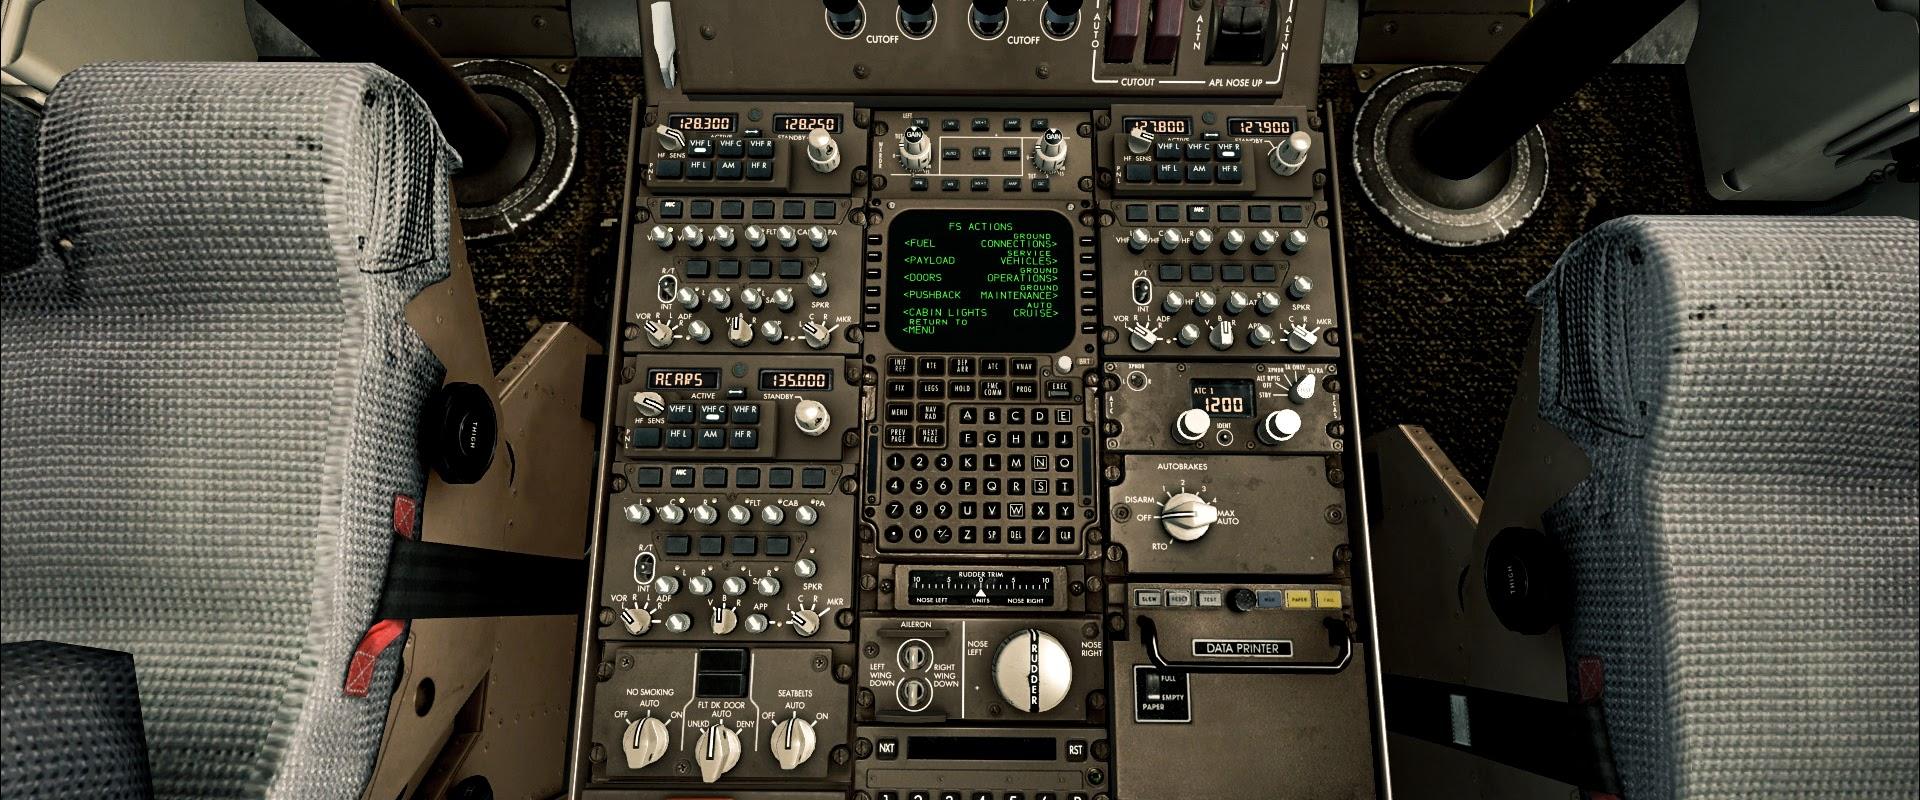 PMDG 747 #1 - my first flight • C-Aviation